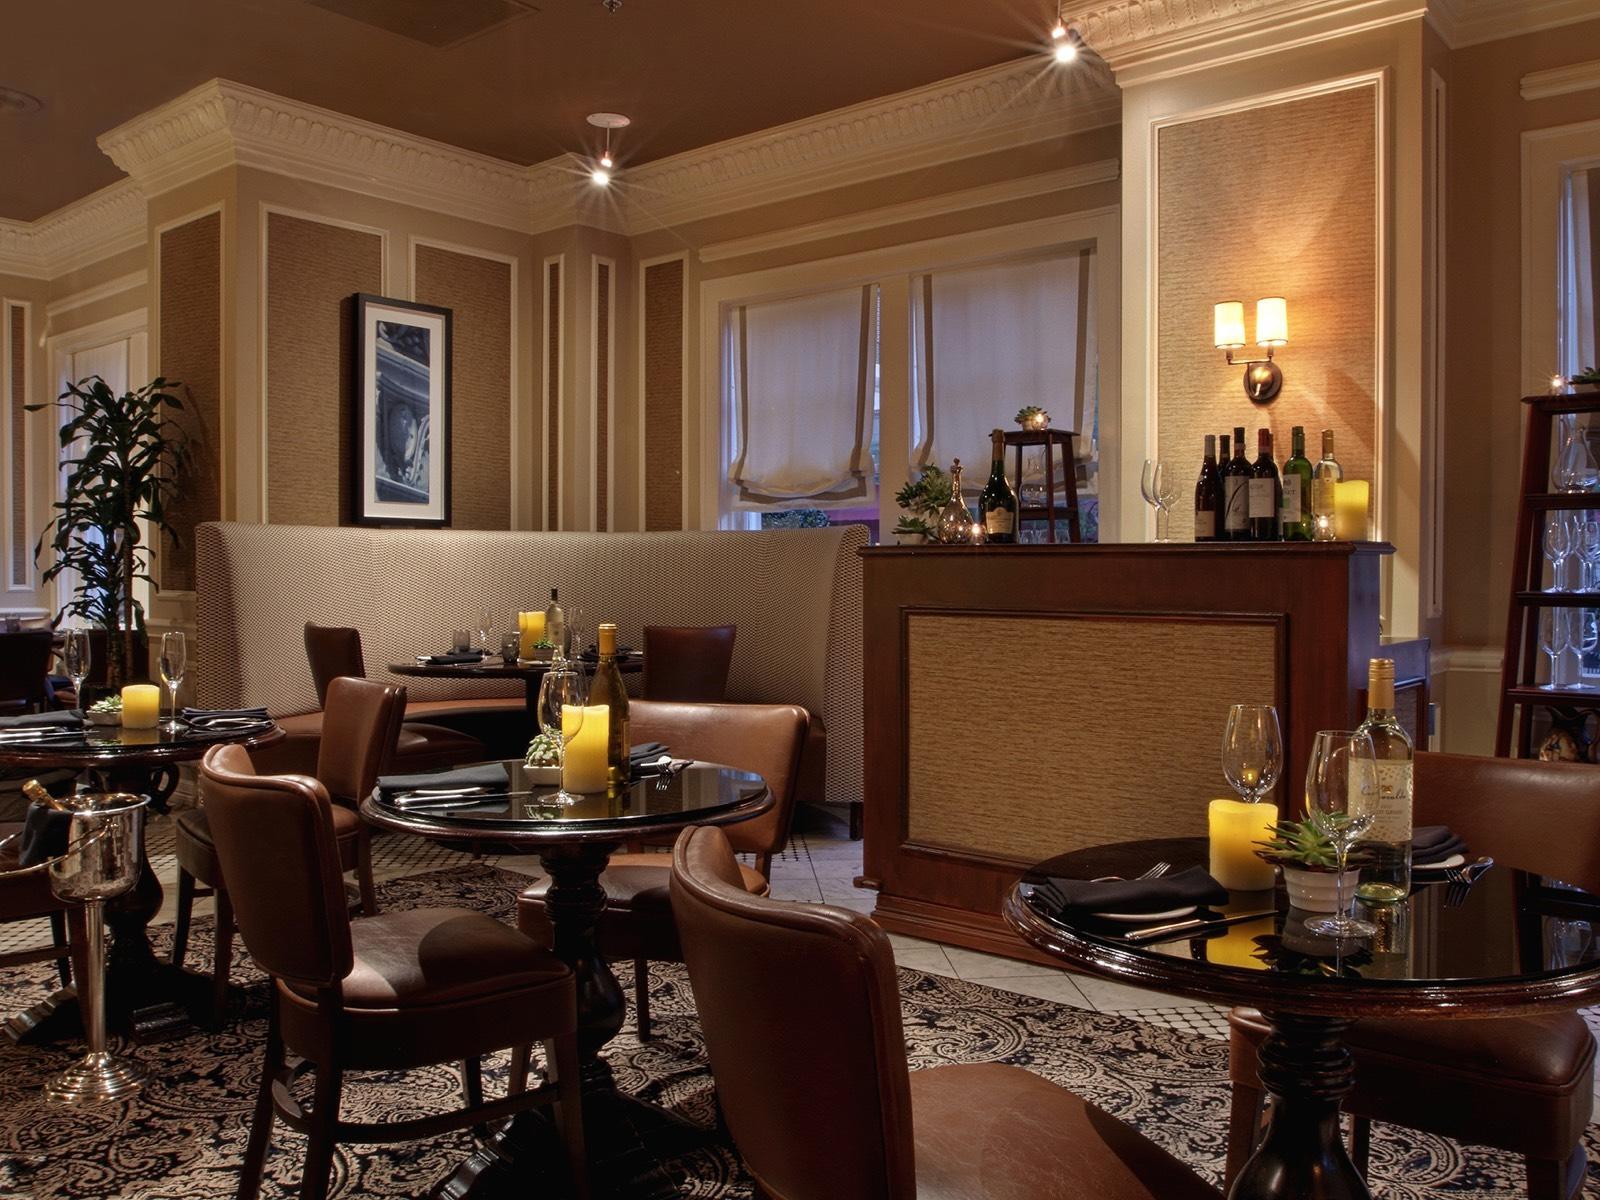 Dining area at The Landmark Restaurant